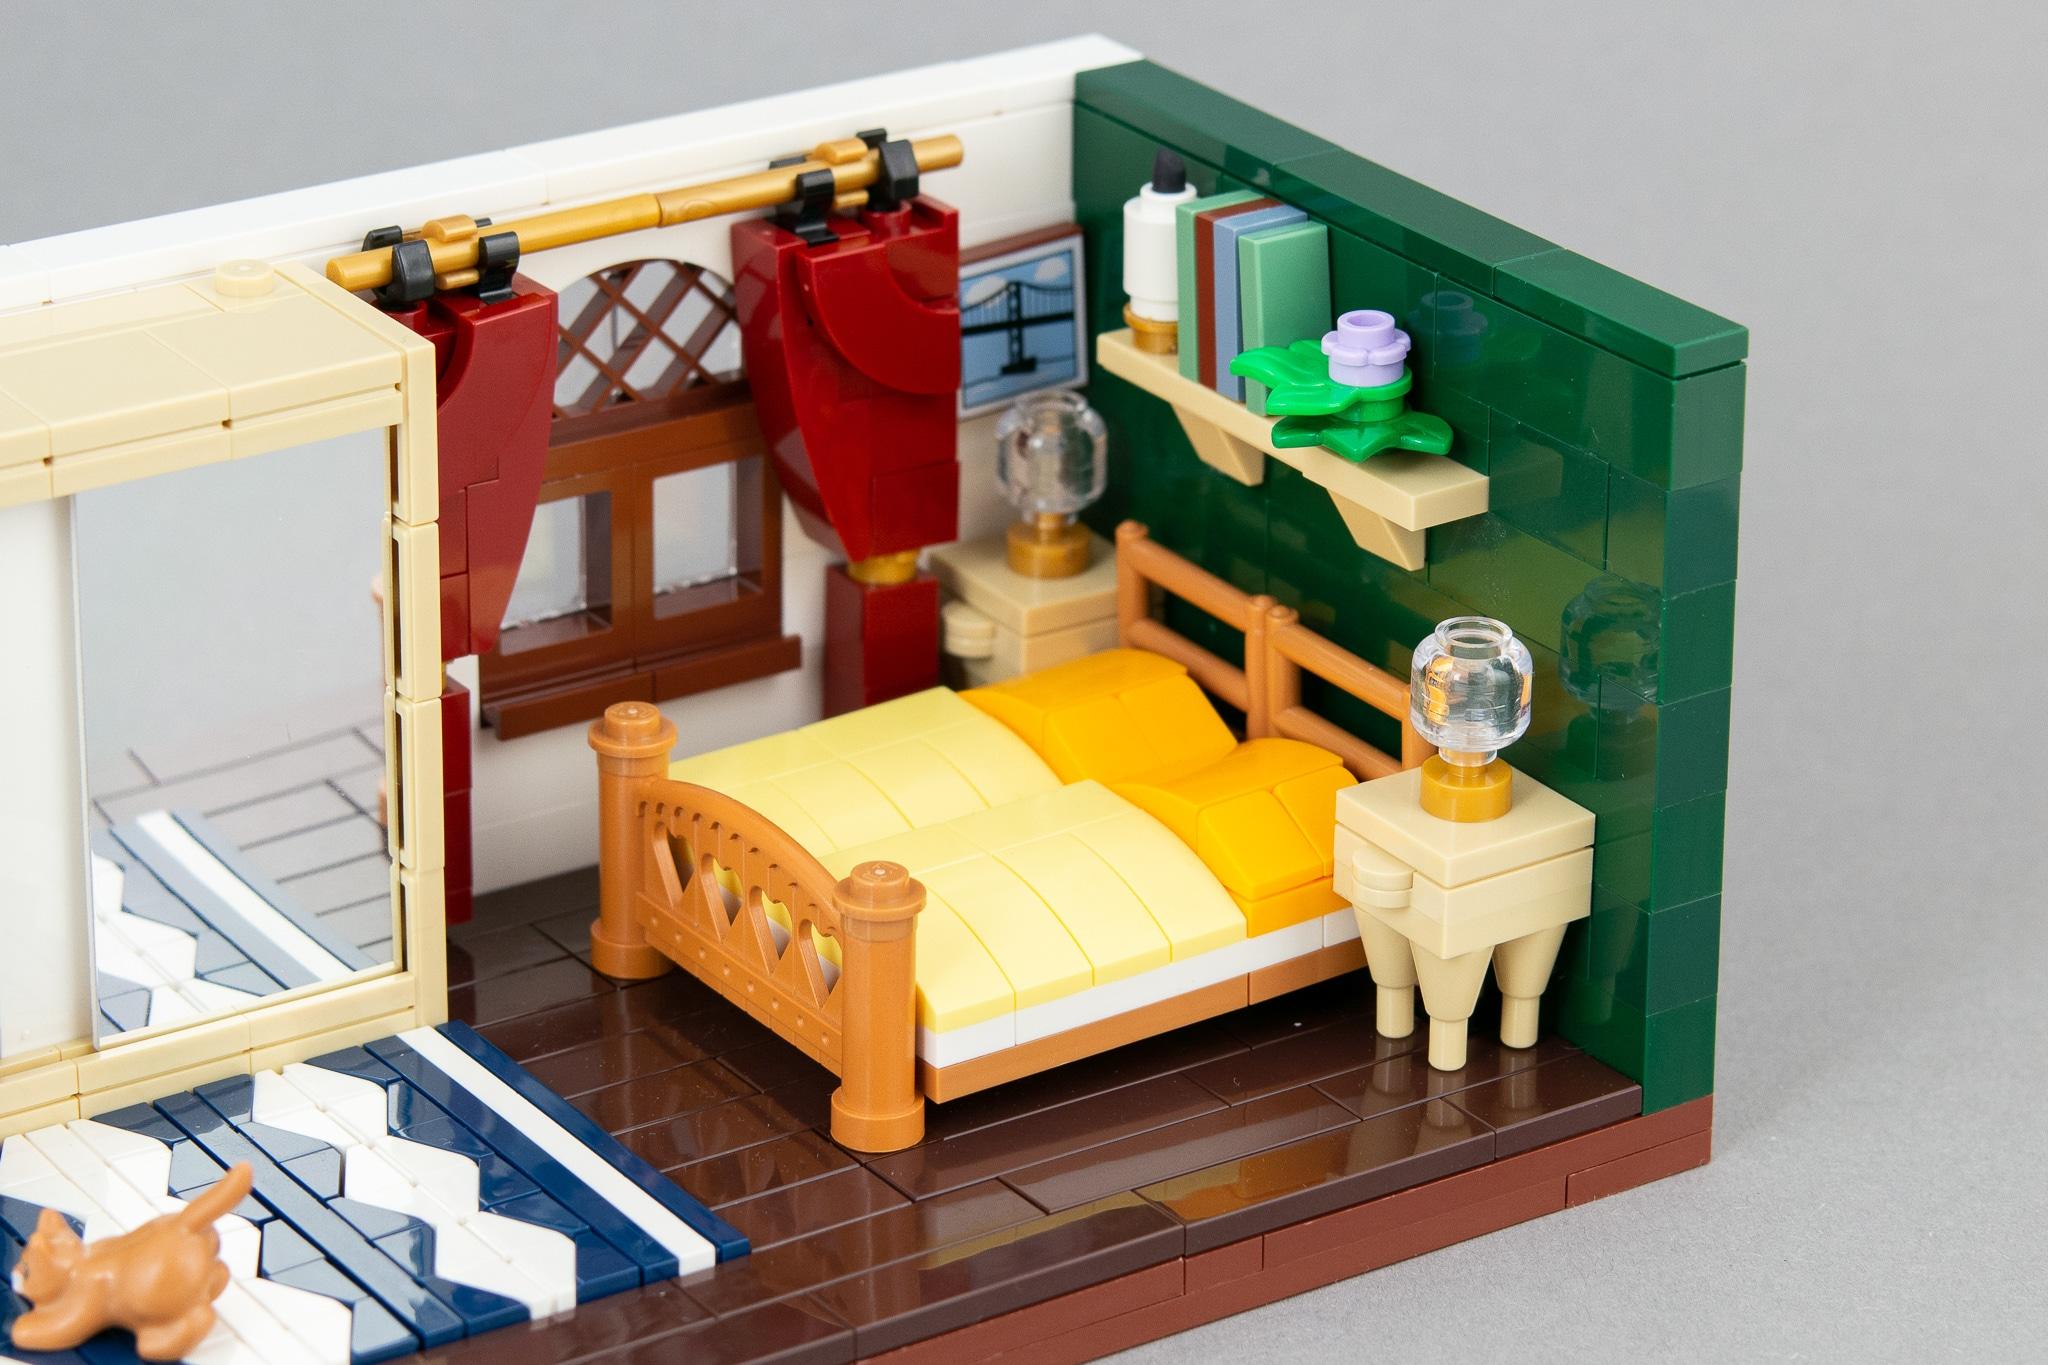 LEGO Schlafzimmer Moc (7)